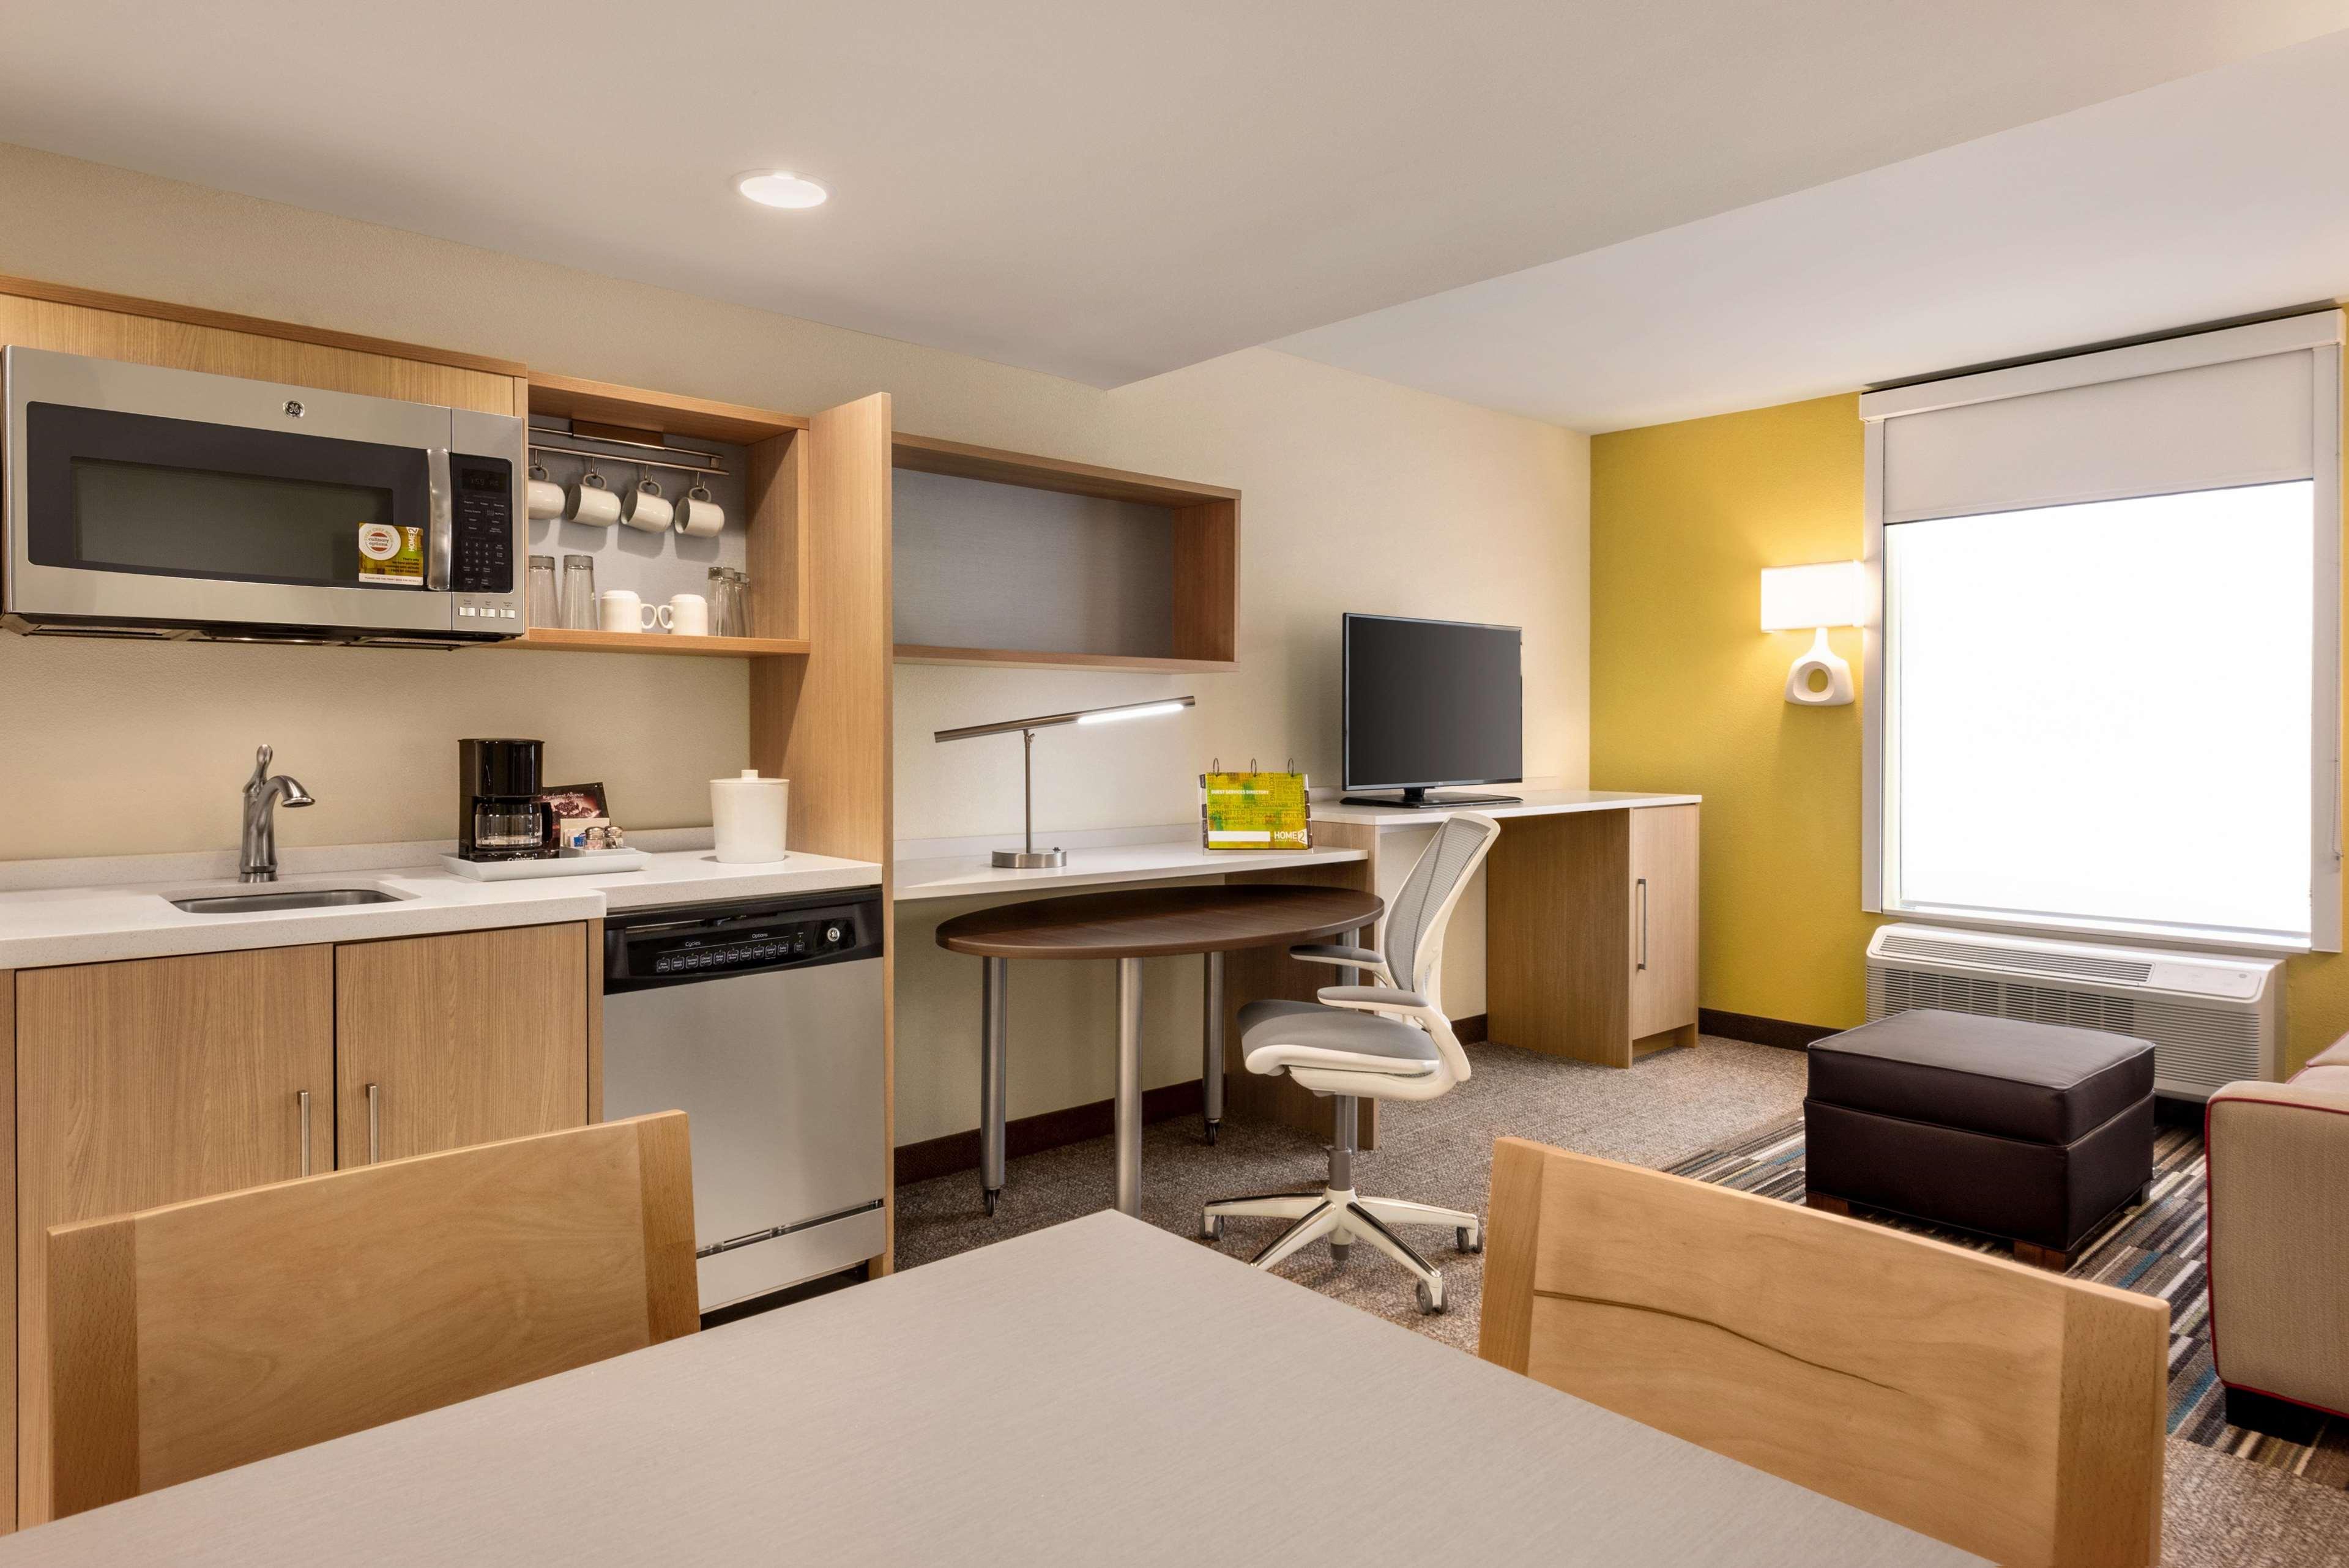 Home2 Suites by Hilton Waco image 9